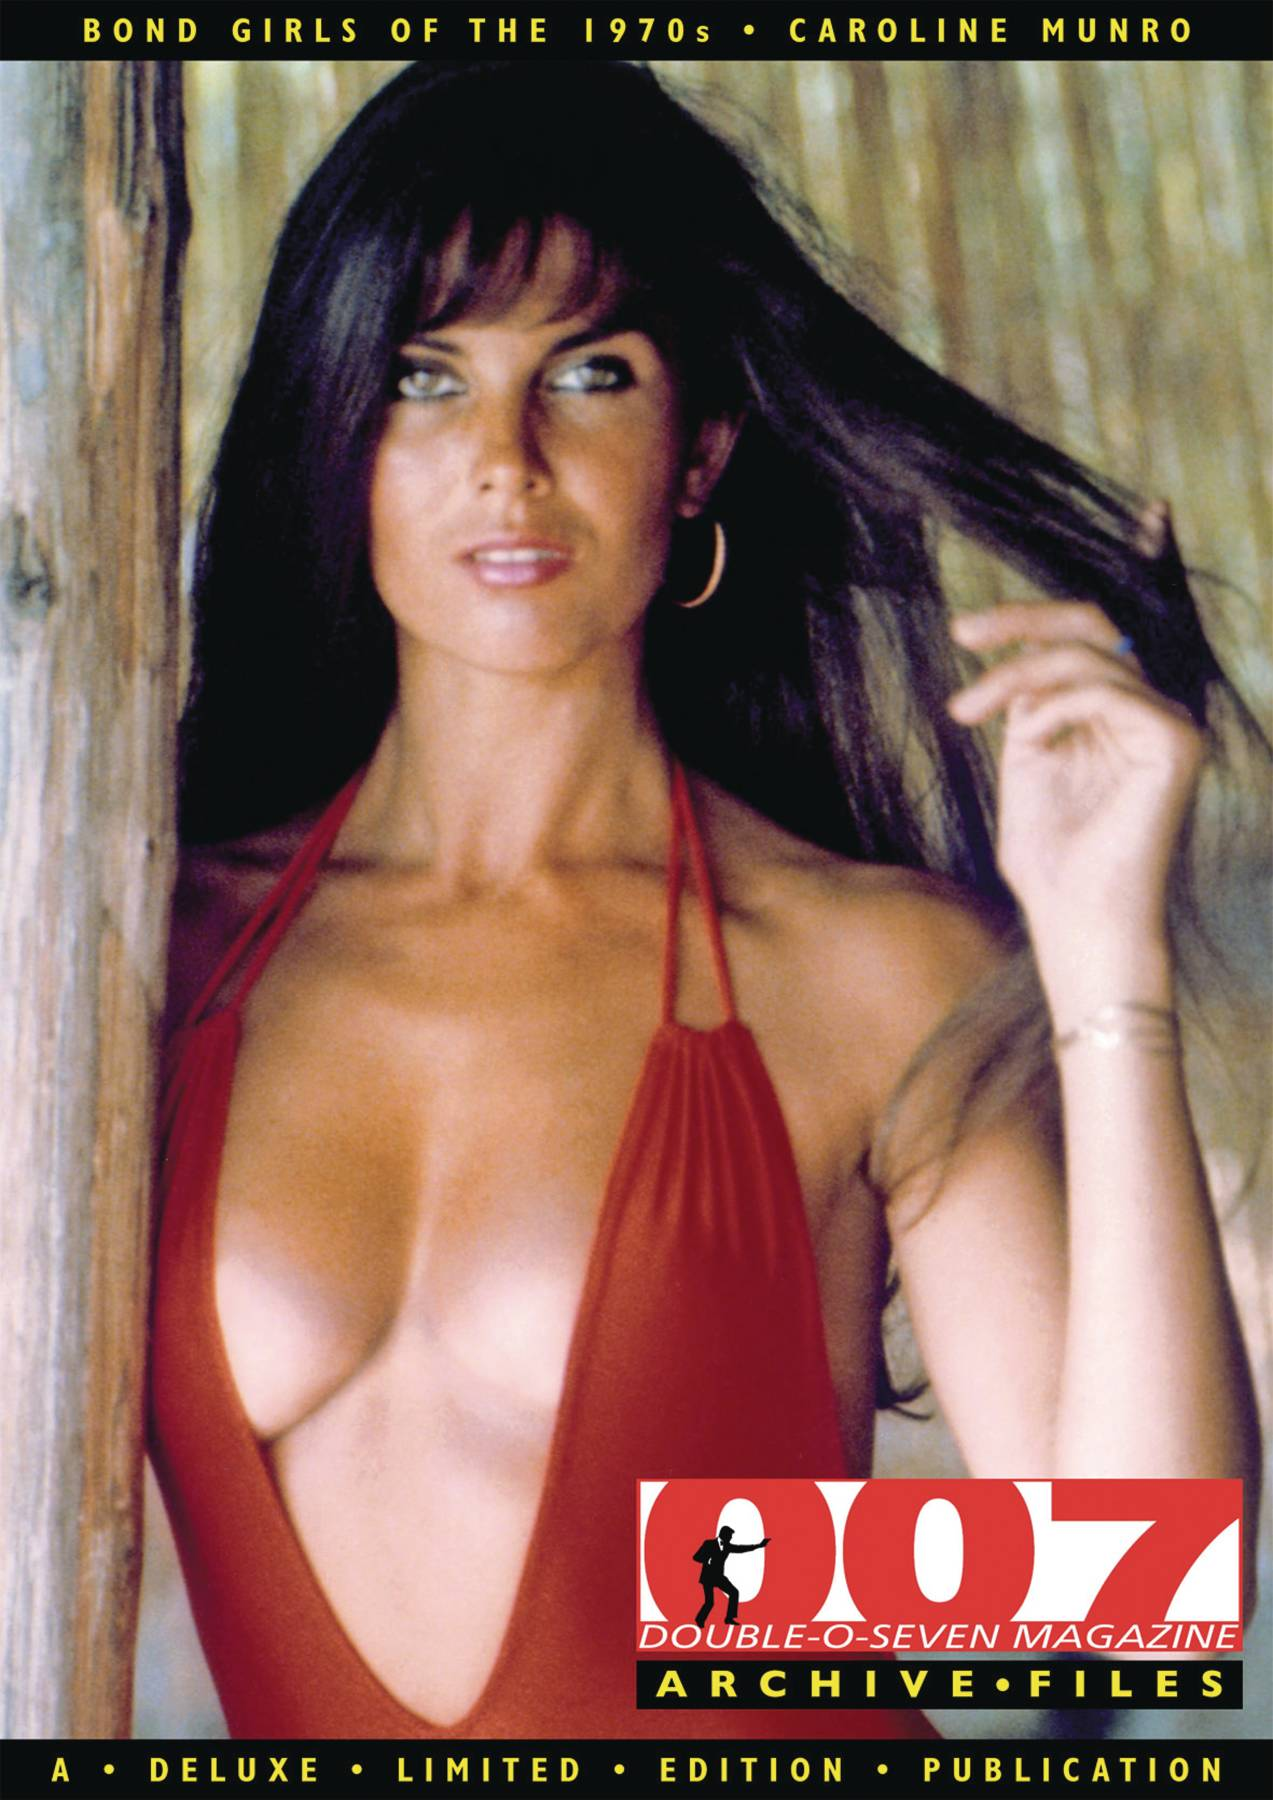 007 Magazine Bond Girls 1970 S Caroline Munro